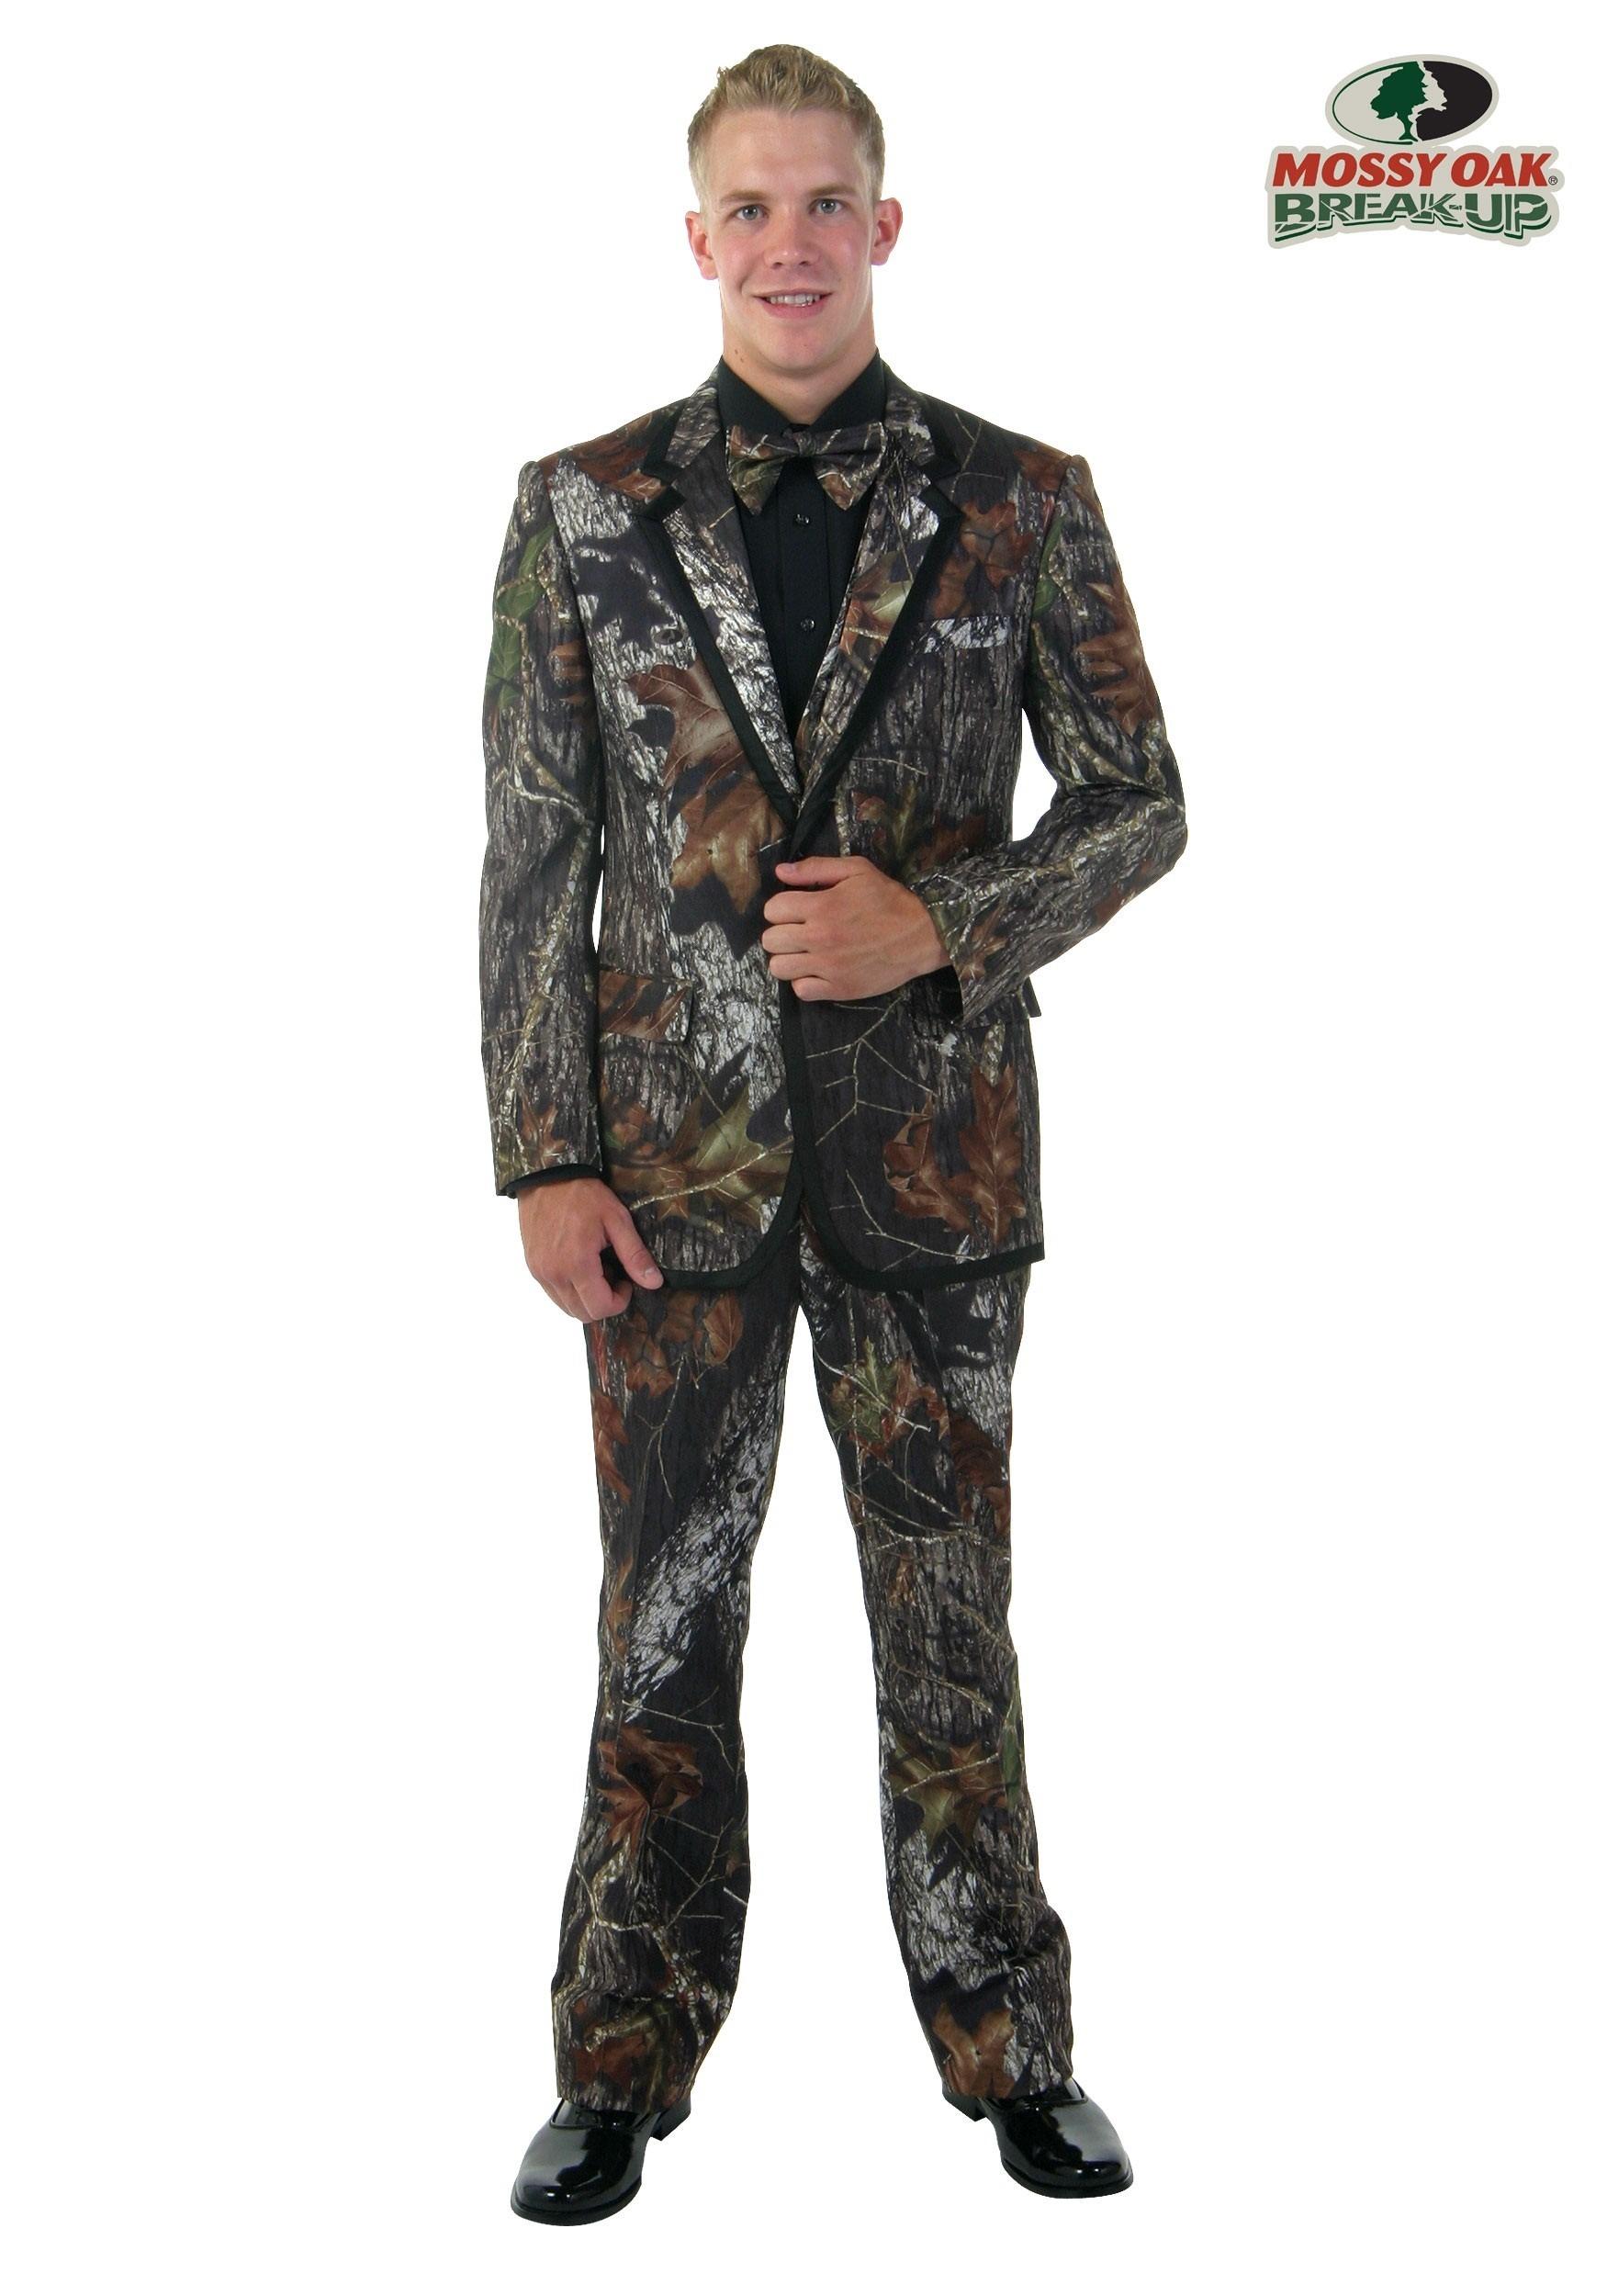 camouflage wedding dresses and tuxedos camouflage wedding dress Camouflage Wedding Dresses And Tuxedos 89